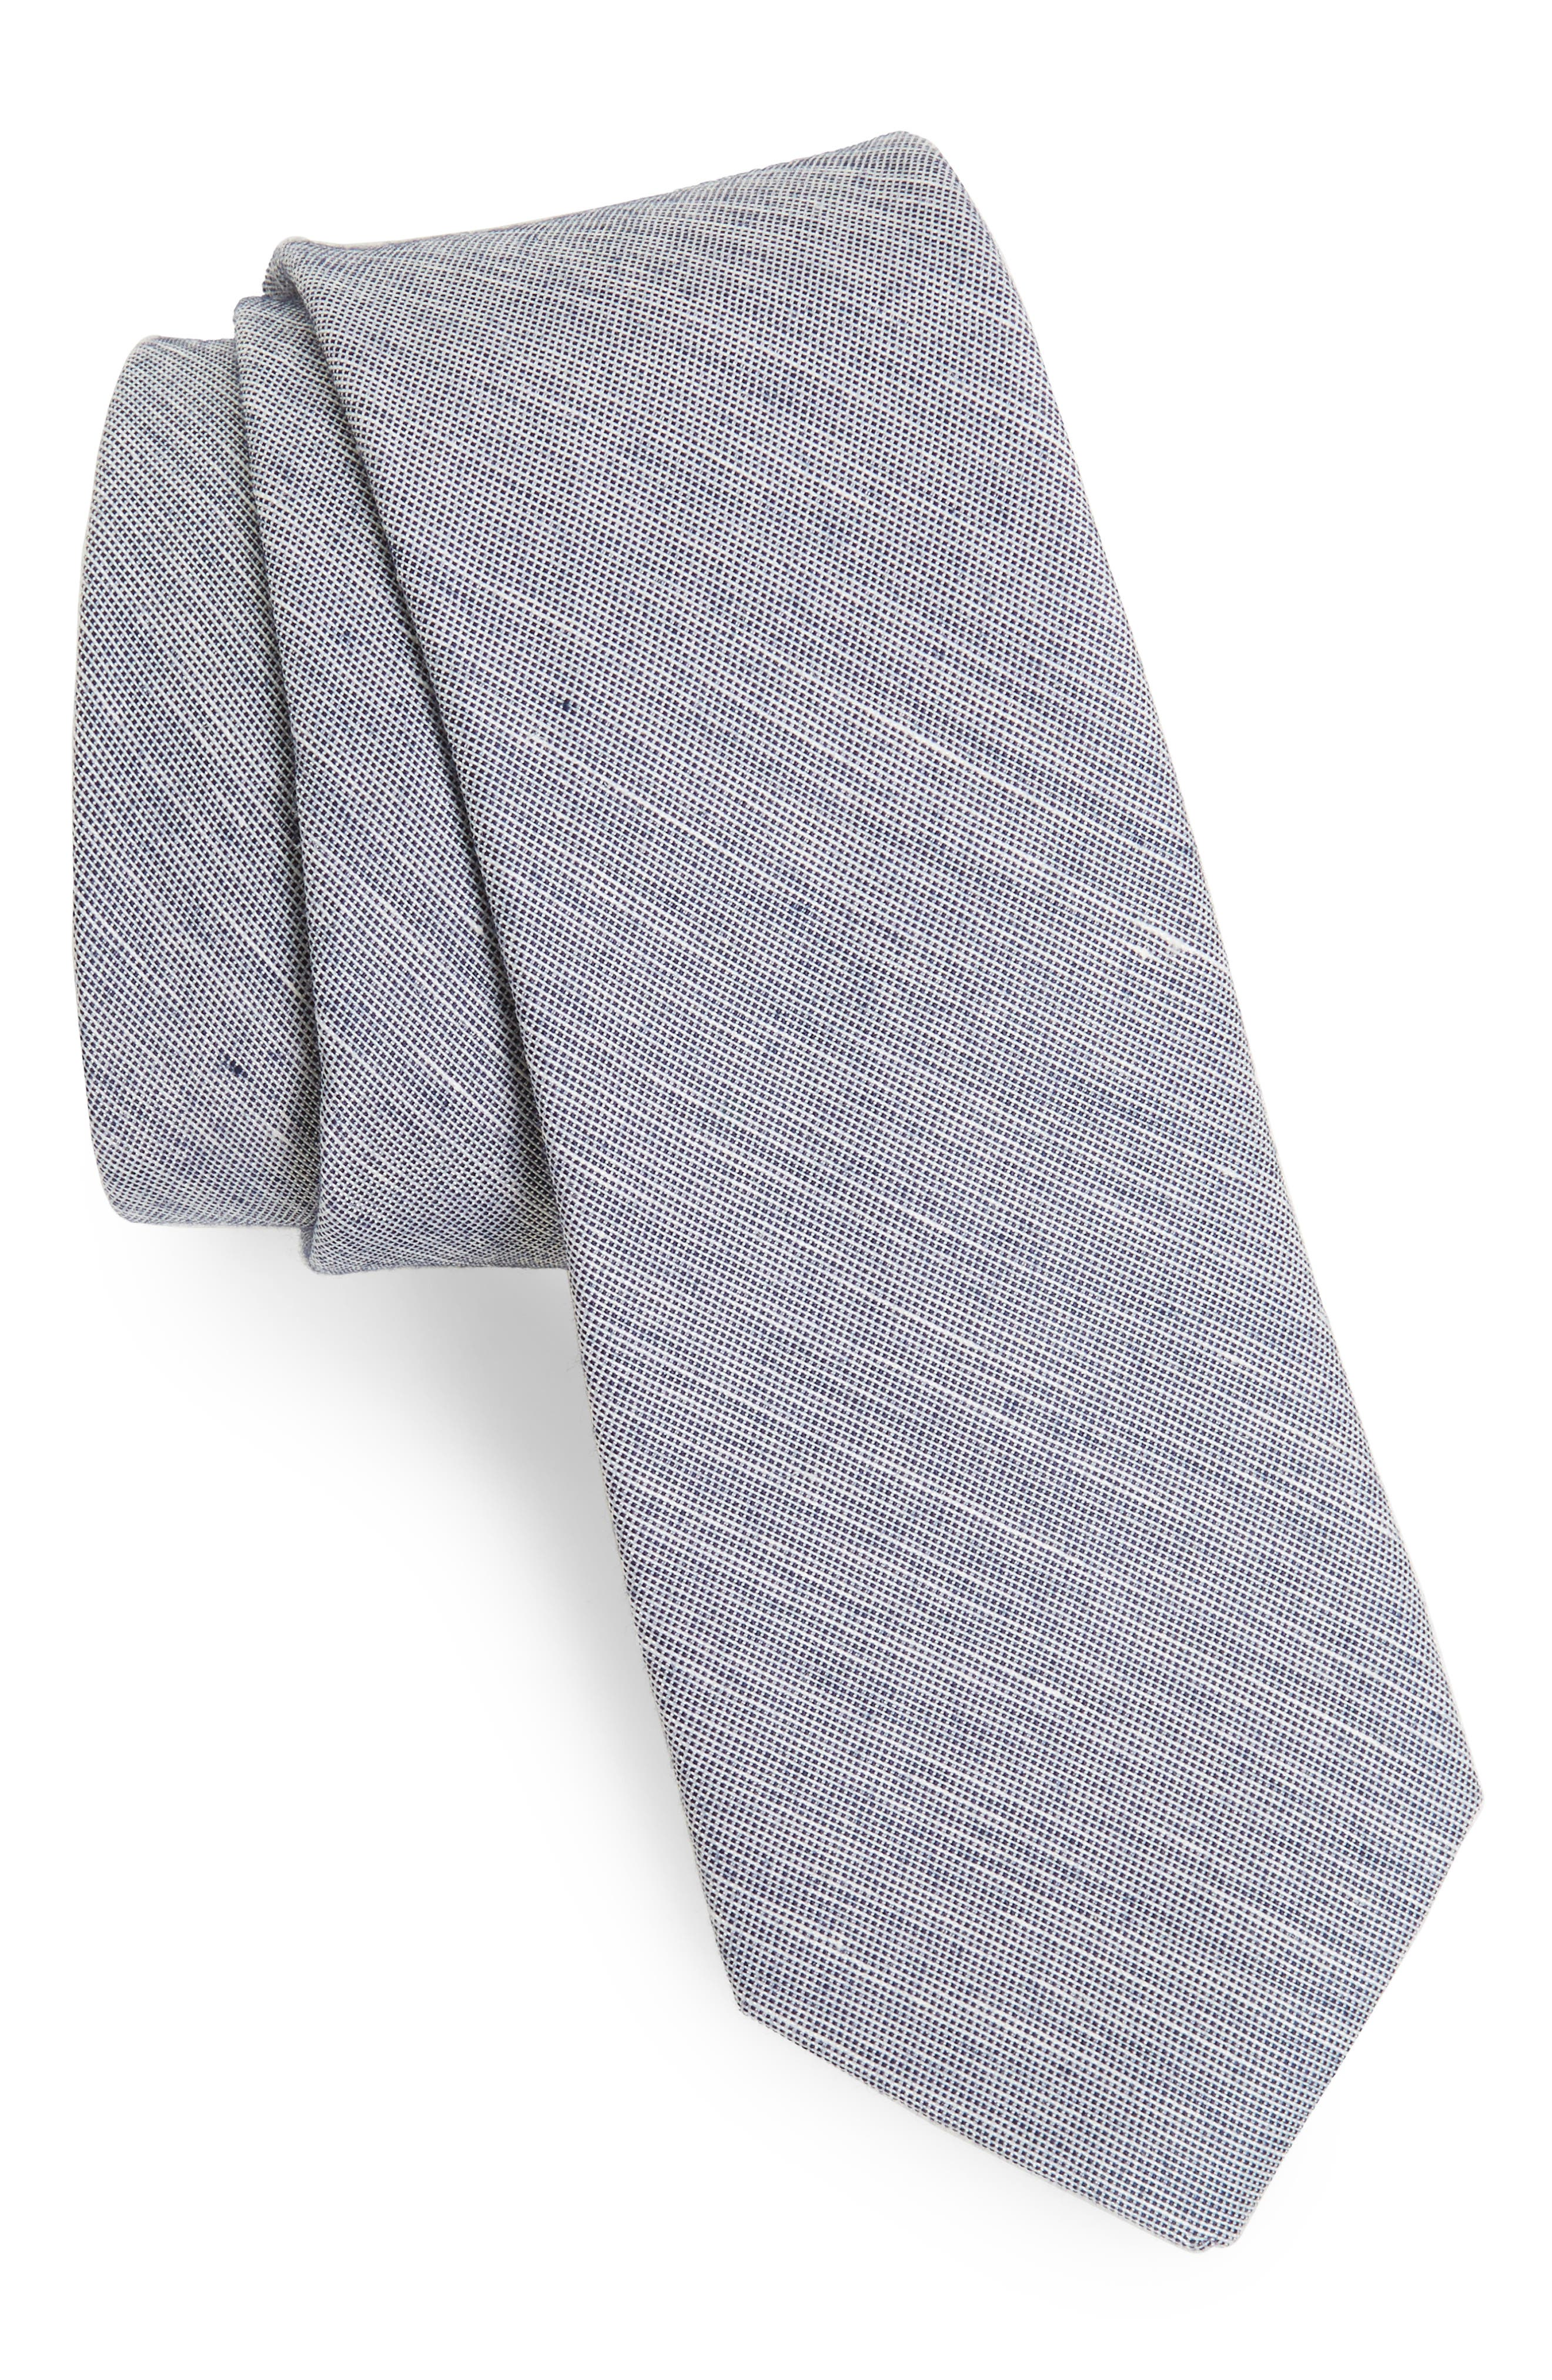 Adena Solid Silk Blend Skinny Tie,                             Main thumbnail 4, color,